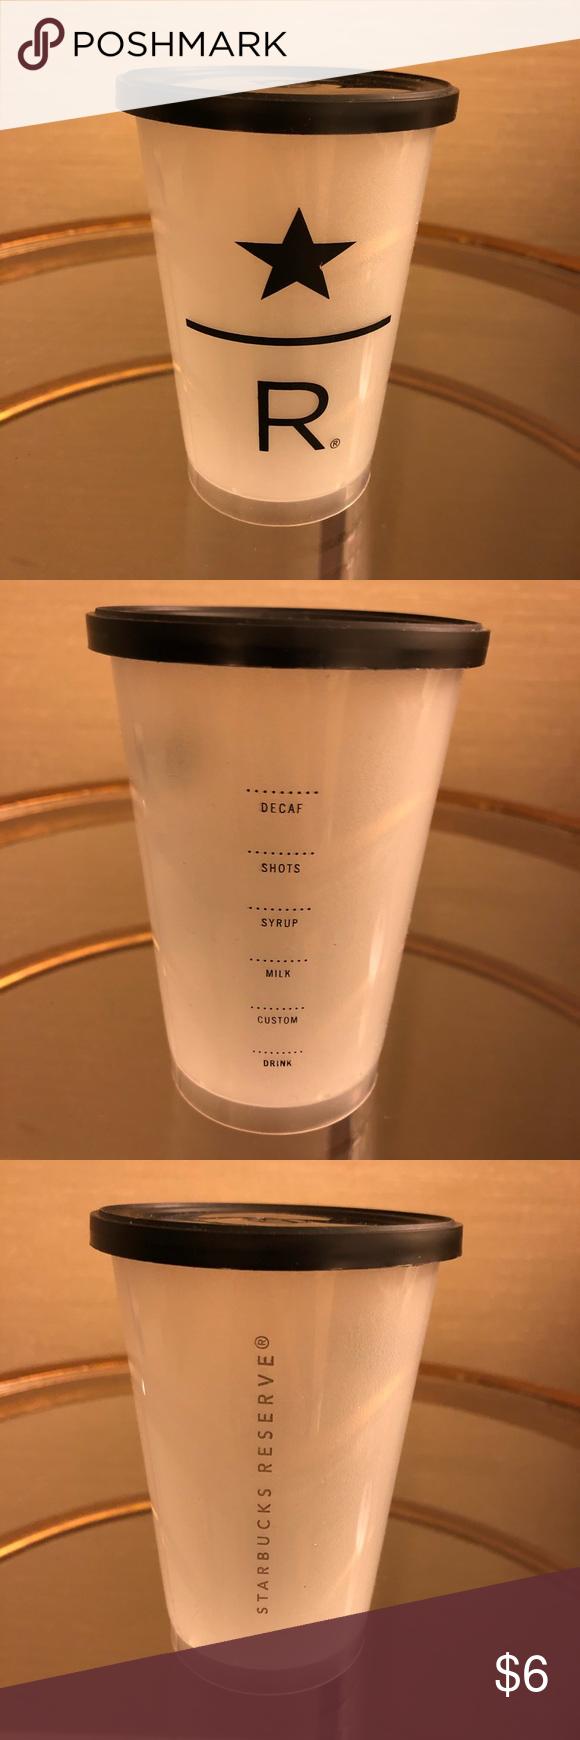 Starbucks Reserve Plastic Coffee Cups with Lids Price